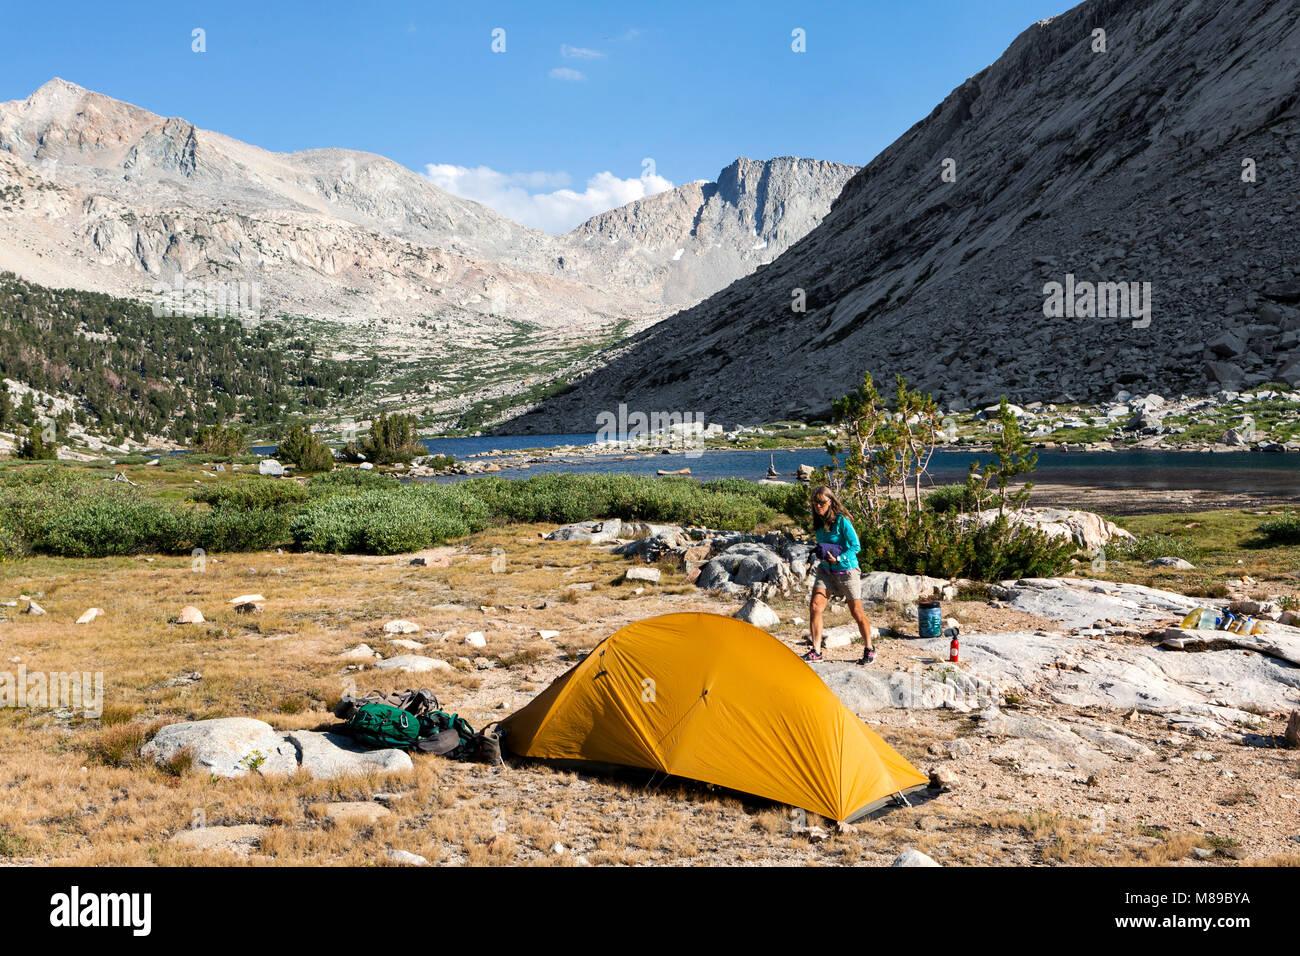 CA03312-00...CALIFORNIA - Campsite at Palisade Lakes in Kings Canyon National Park along the John Muir Trail. - Stock Image